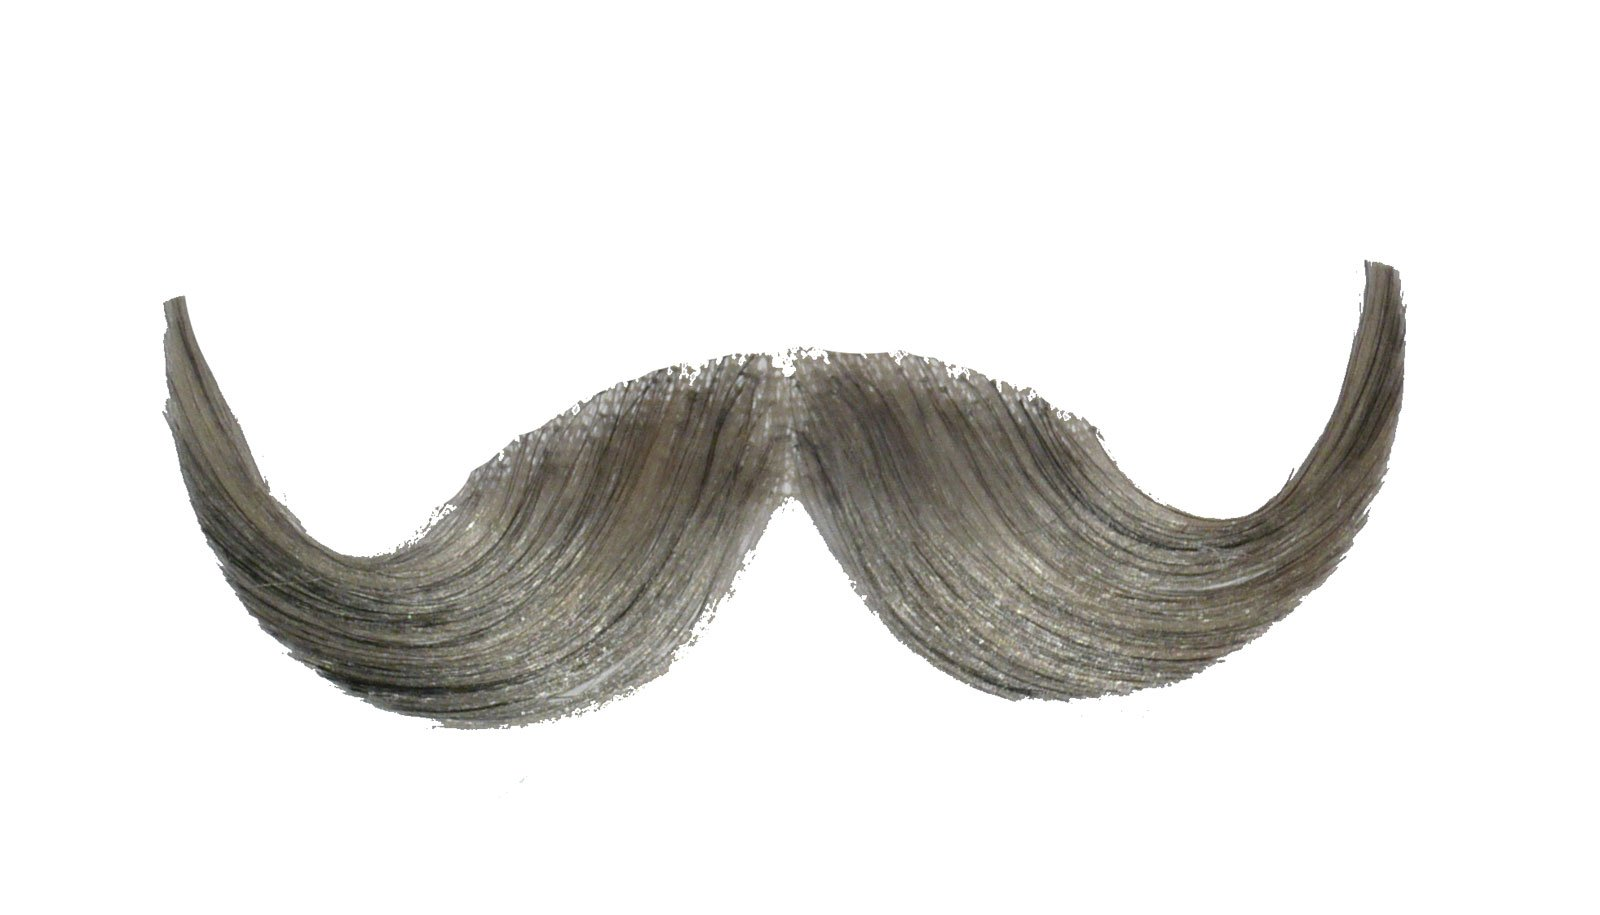 2013 (Light Gray) Human Hair Mustache Handlebar Mustache Includes 6 Free Adhesive Strips